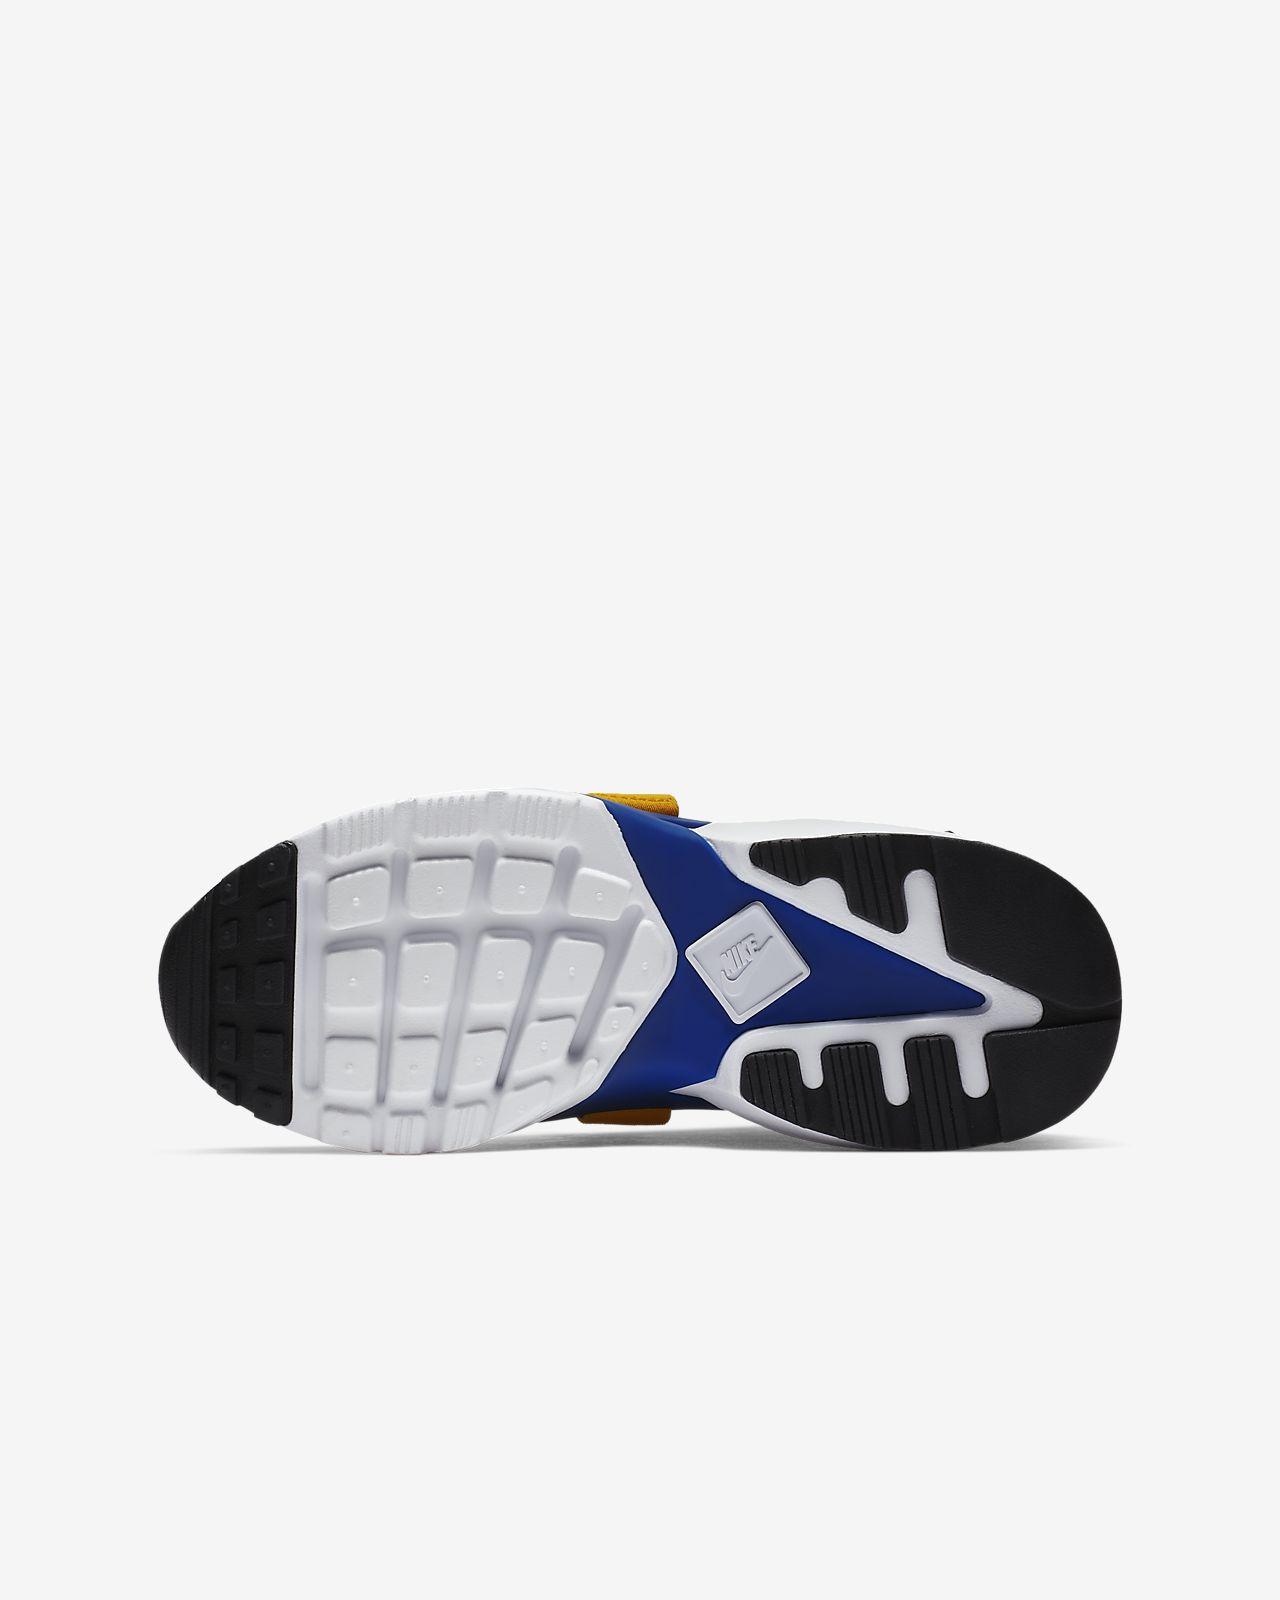 04e1b6c6338d Nike Huarache City Big Kids  Shoe. Nike.com